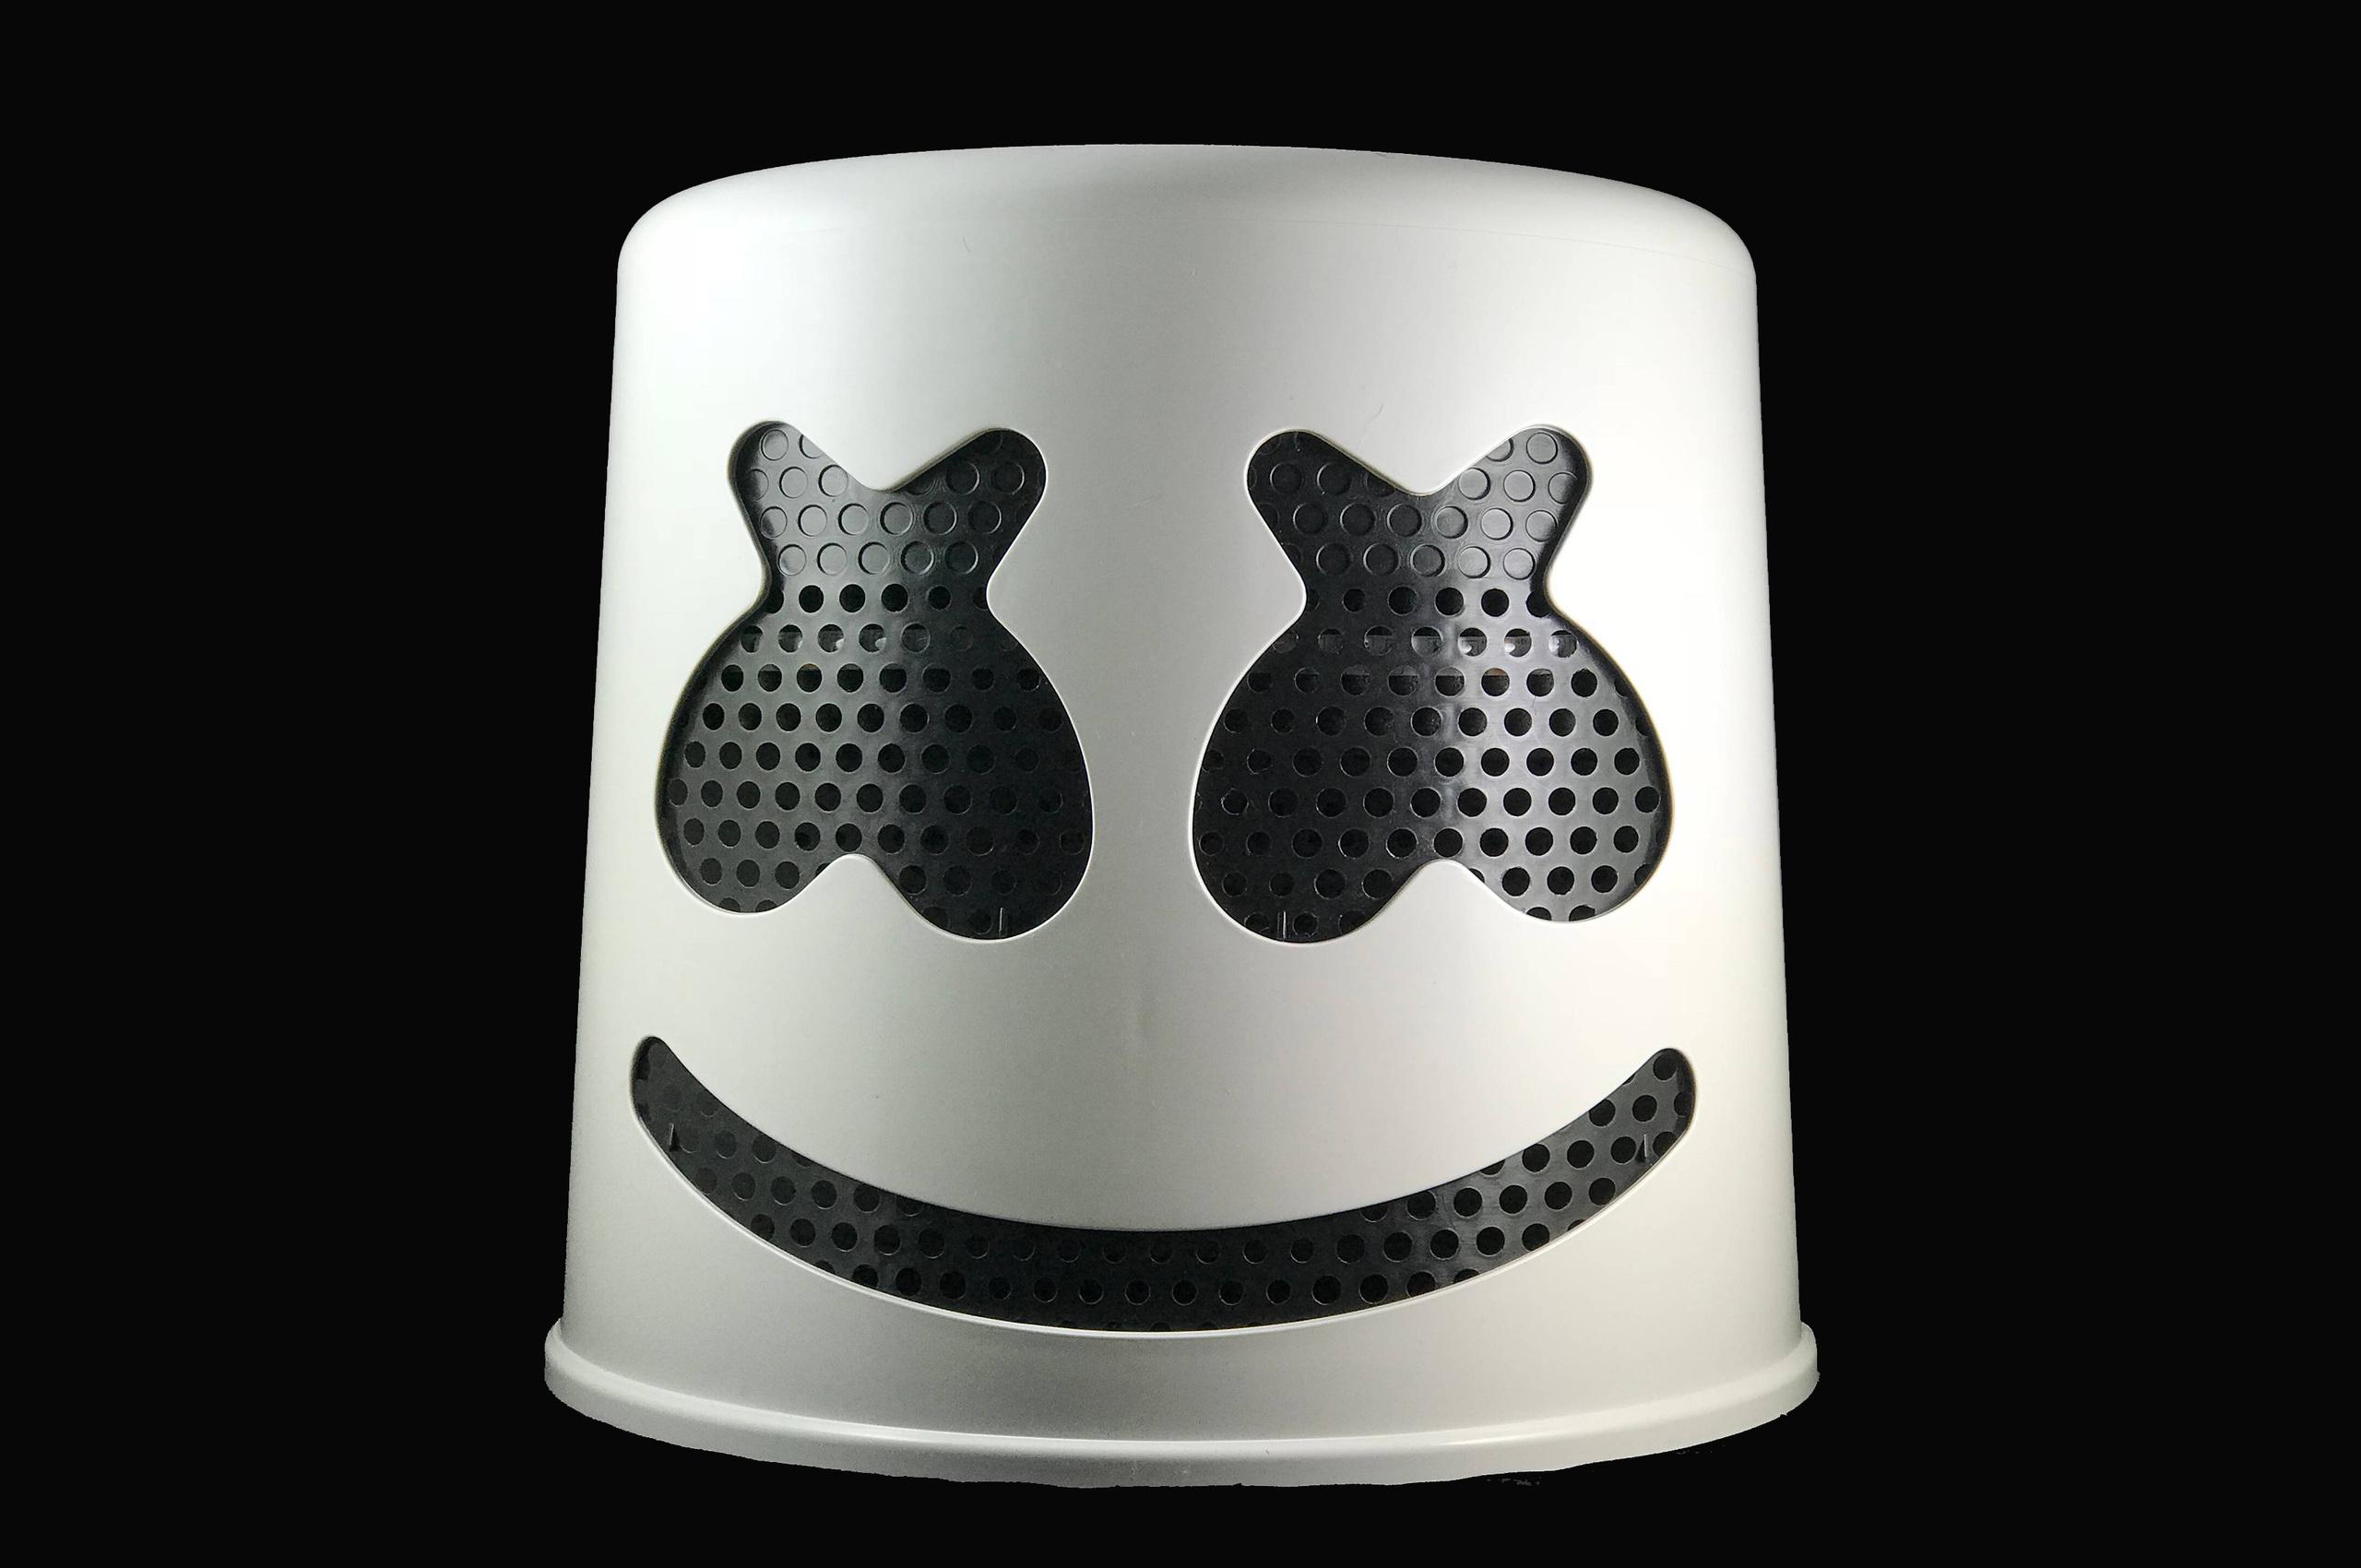 marshmello-mask-4k-ix.jpg